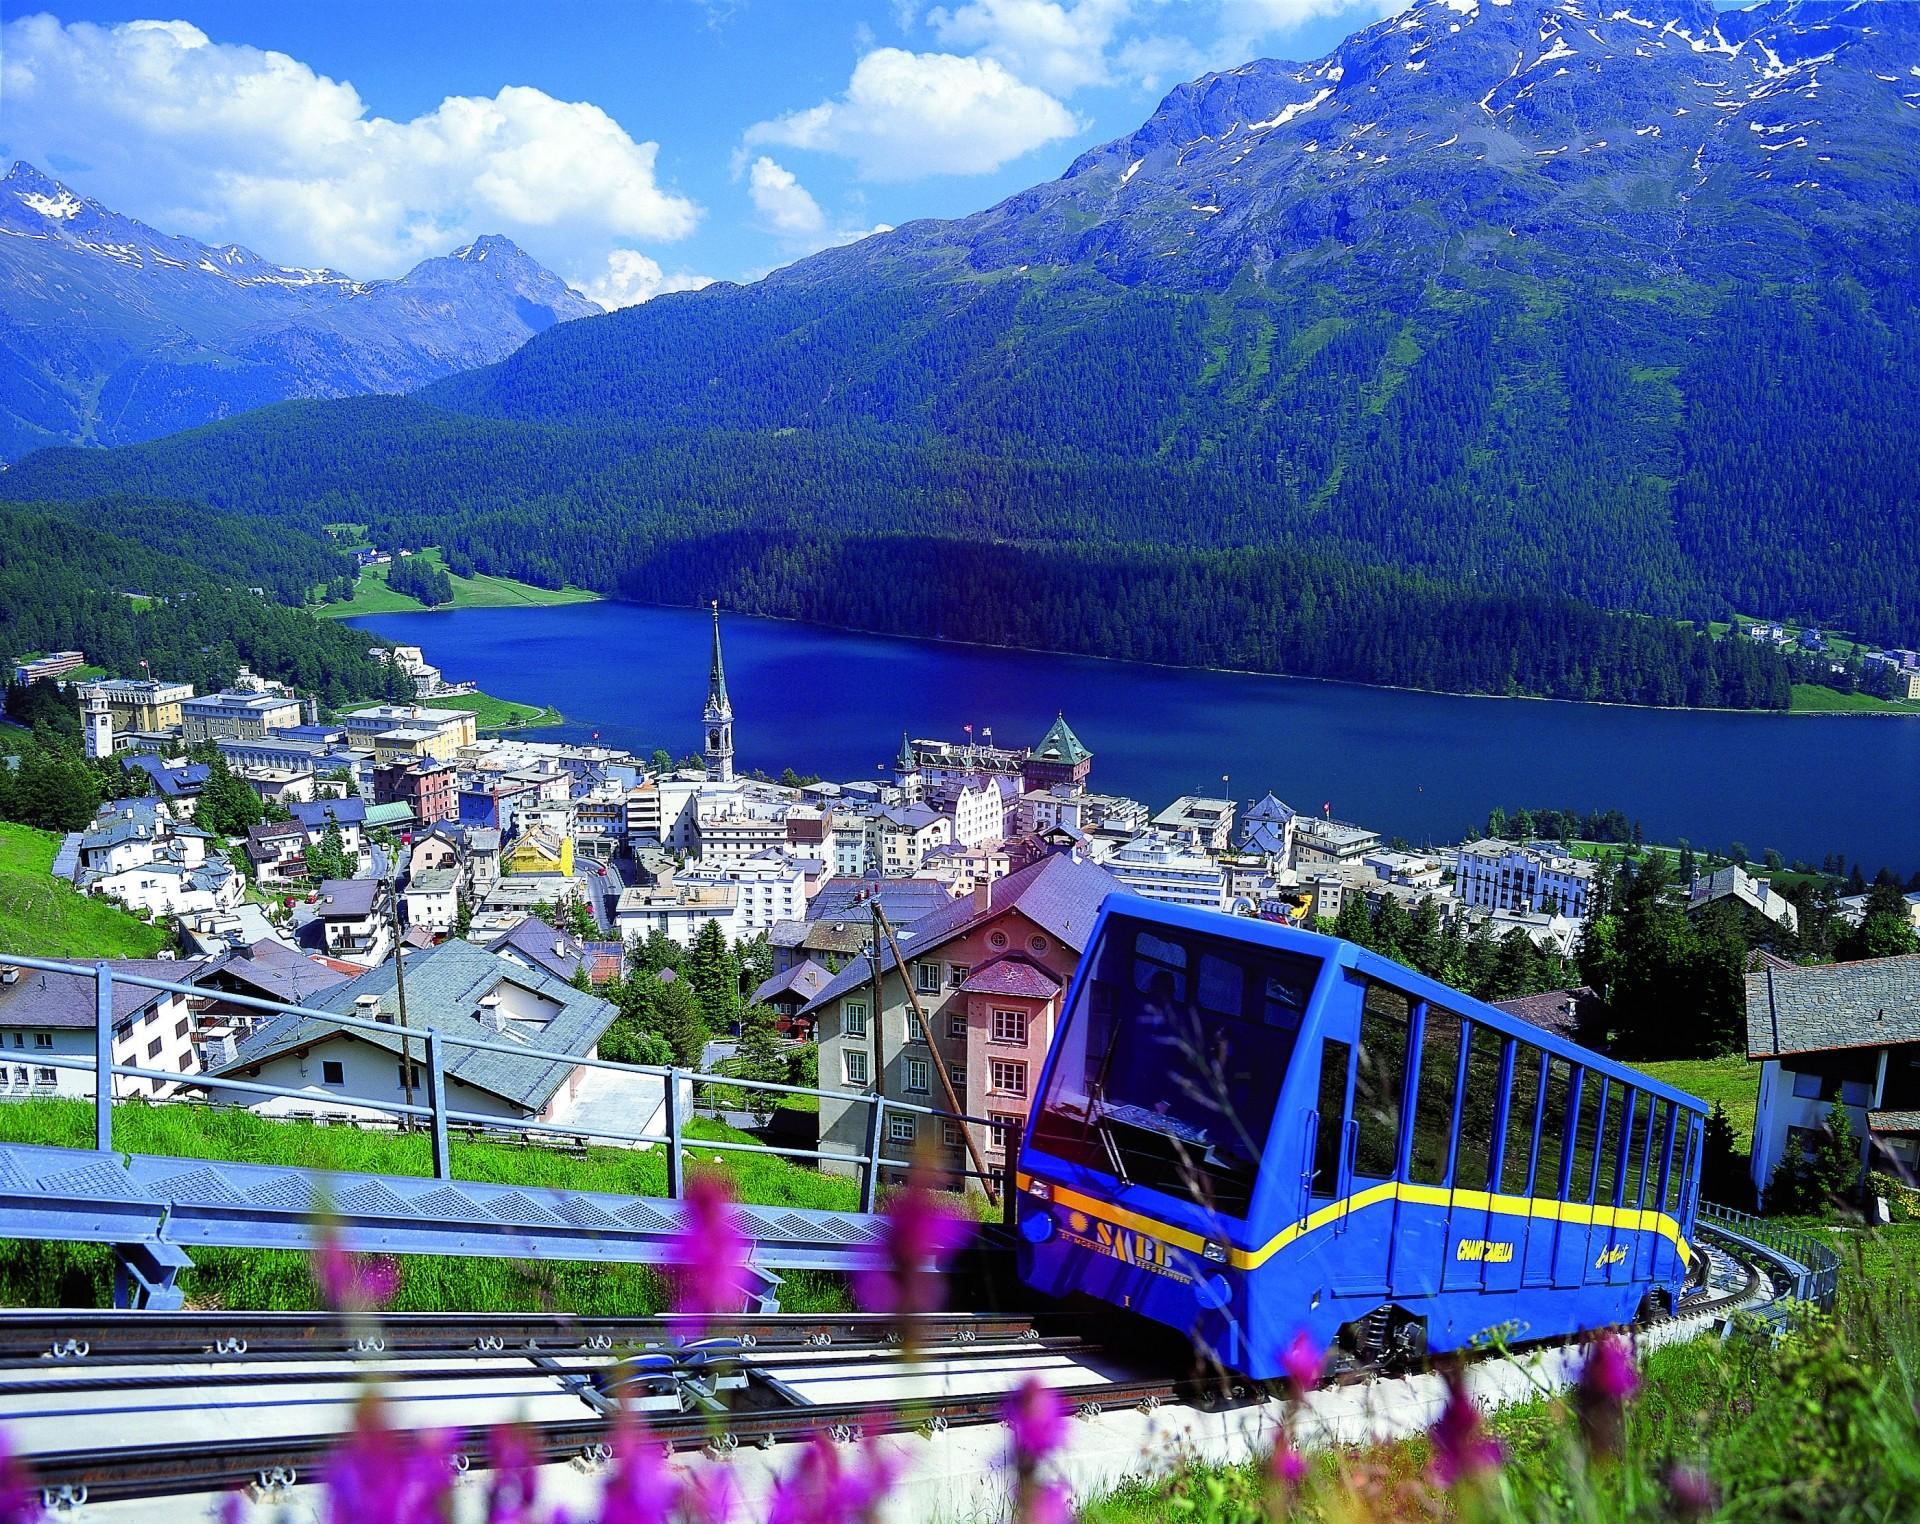 St. Moritz (Foto: Kur- und Verkehrsverein St. Moritz)